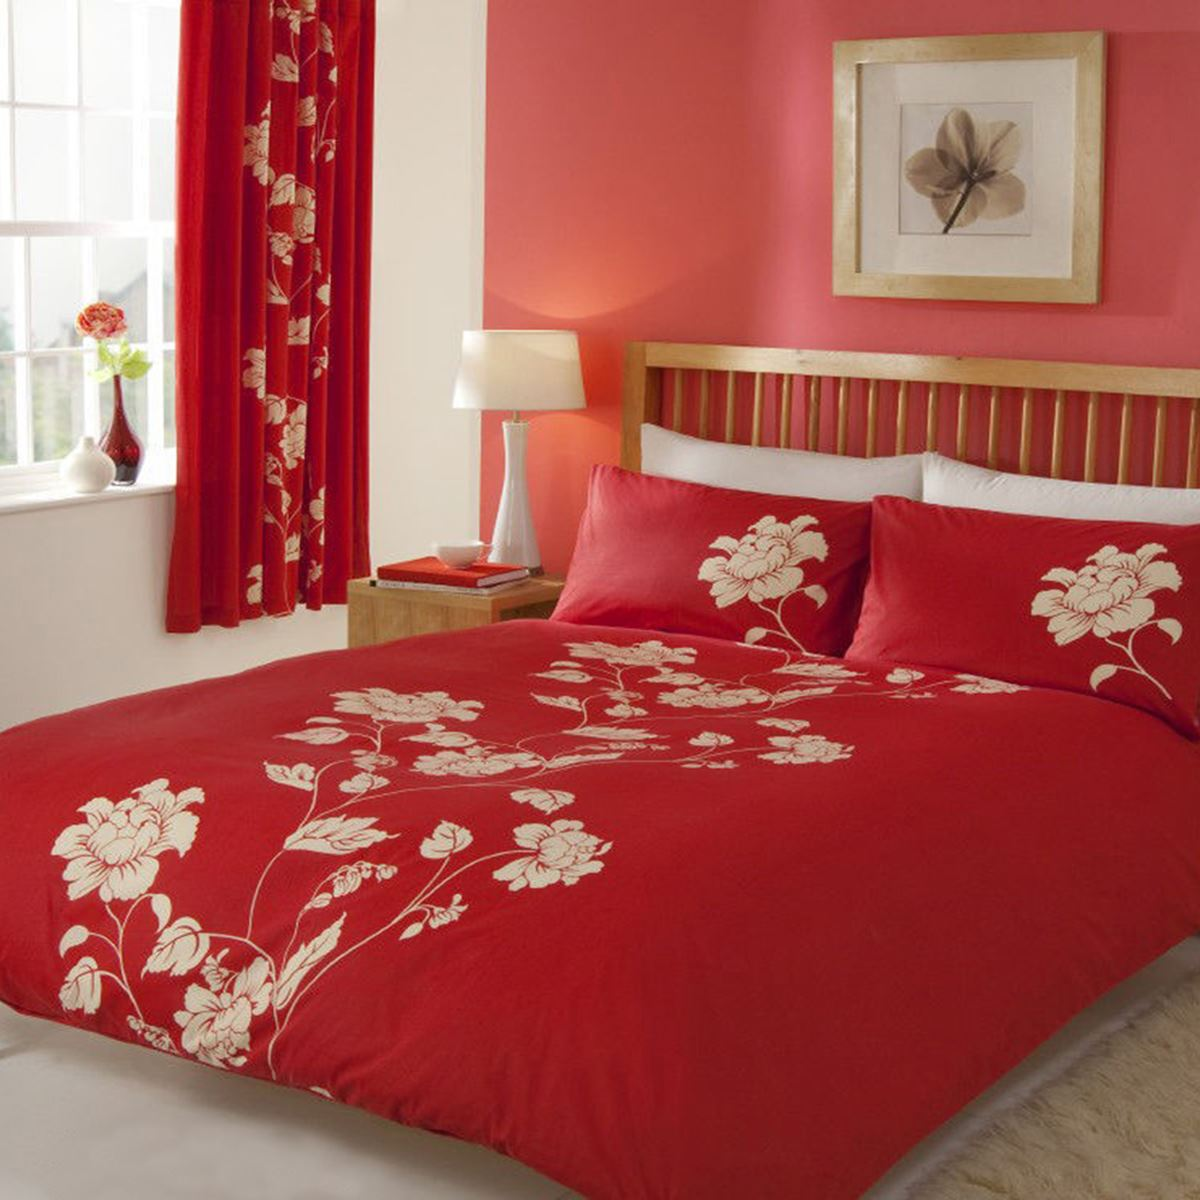 luxury duvet cover pillow case quilt cover bed set